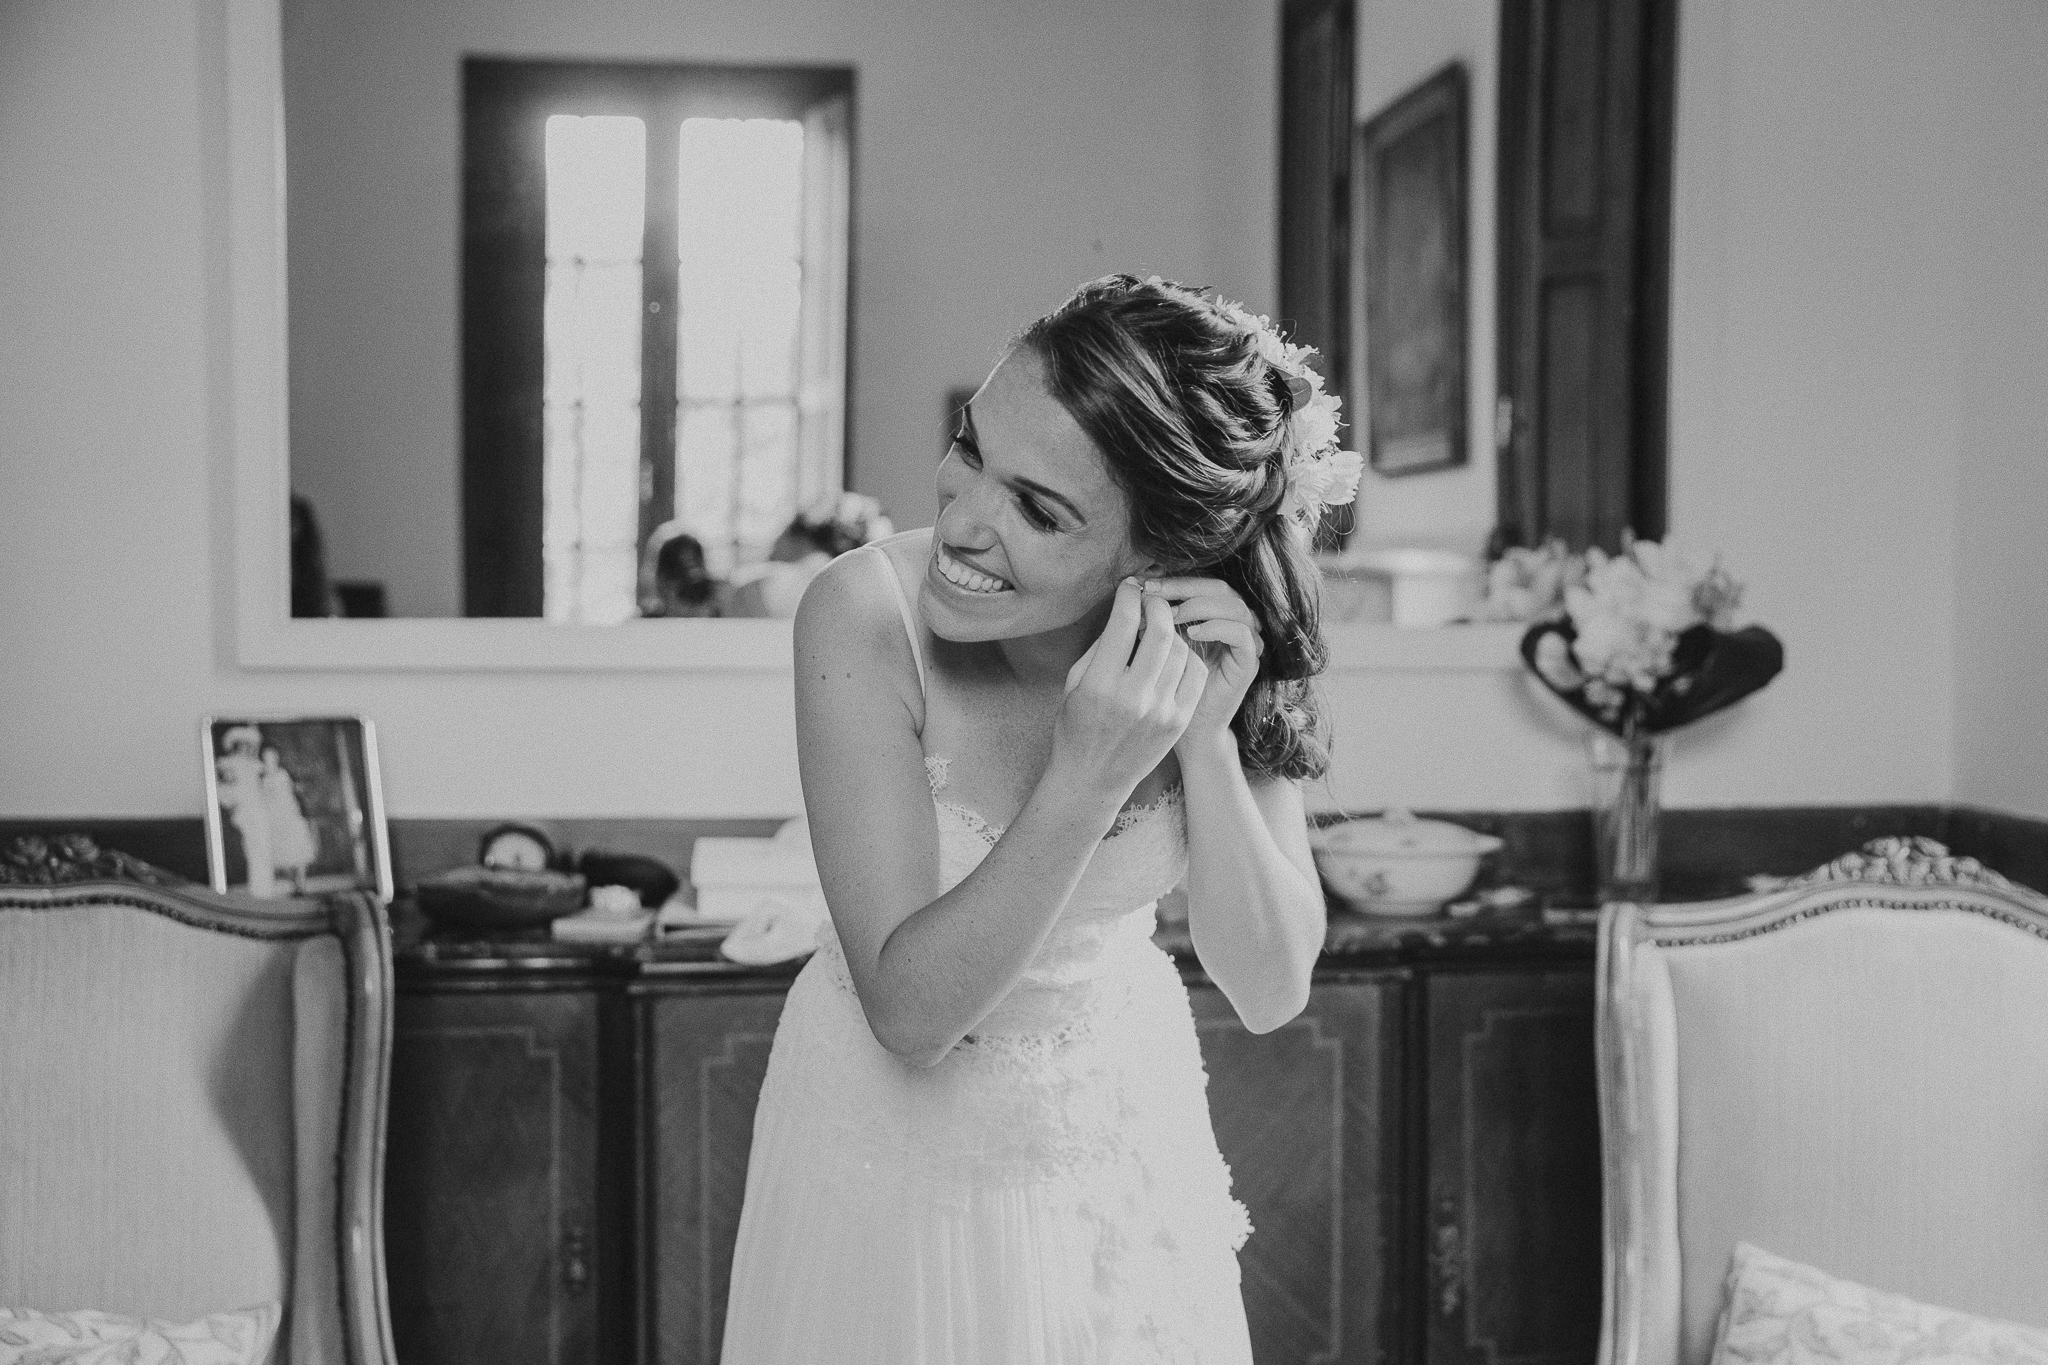 fotografia de bodas punta del este - uruguay - nye02